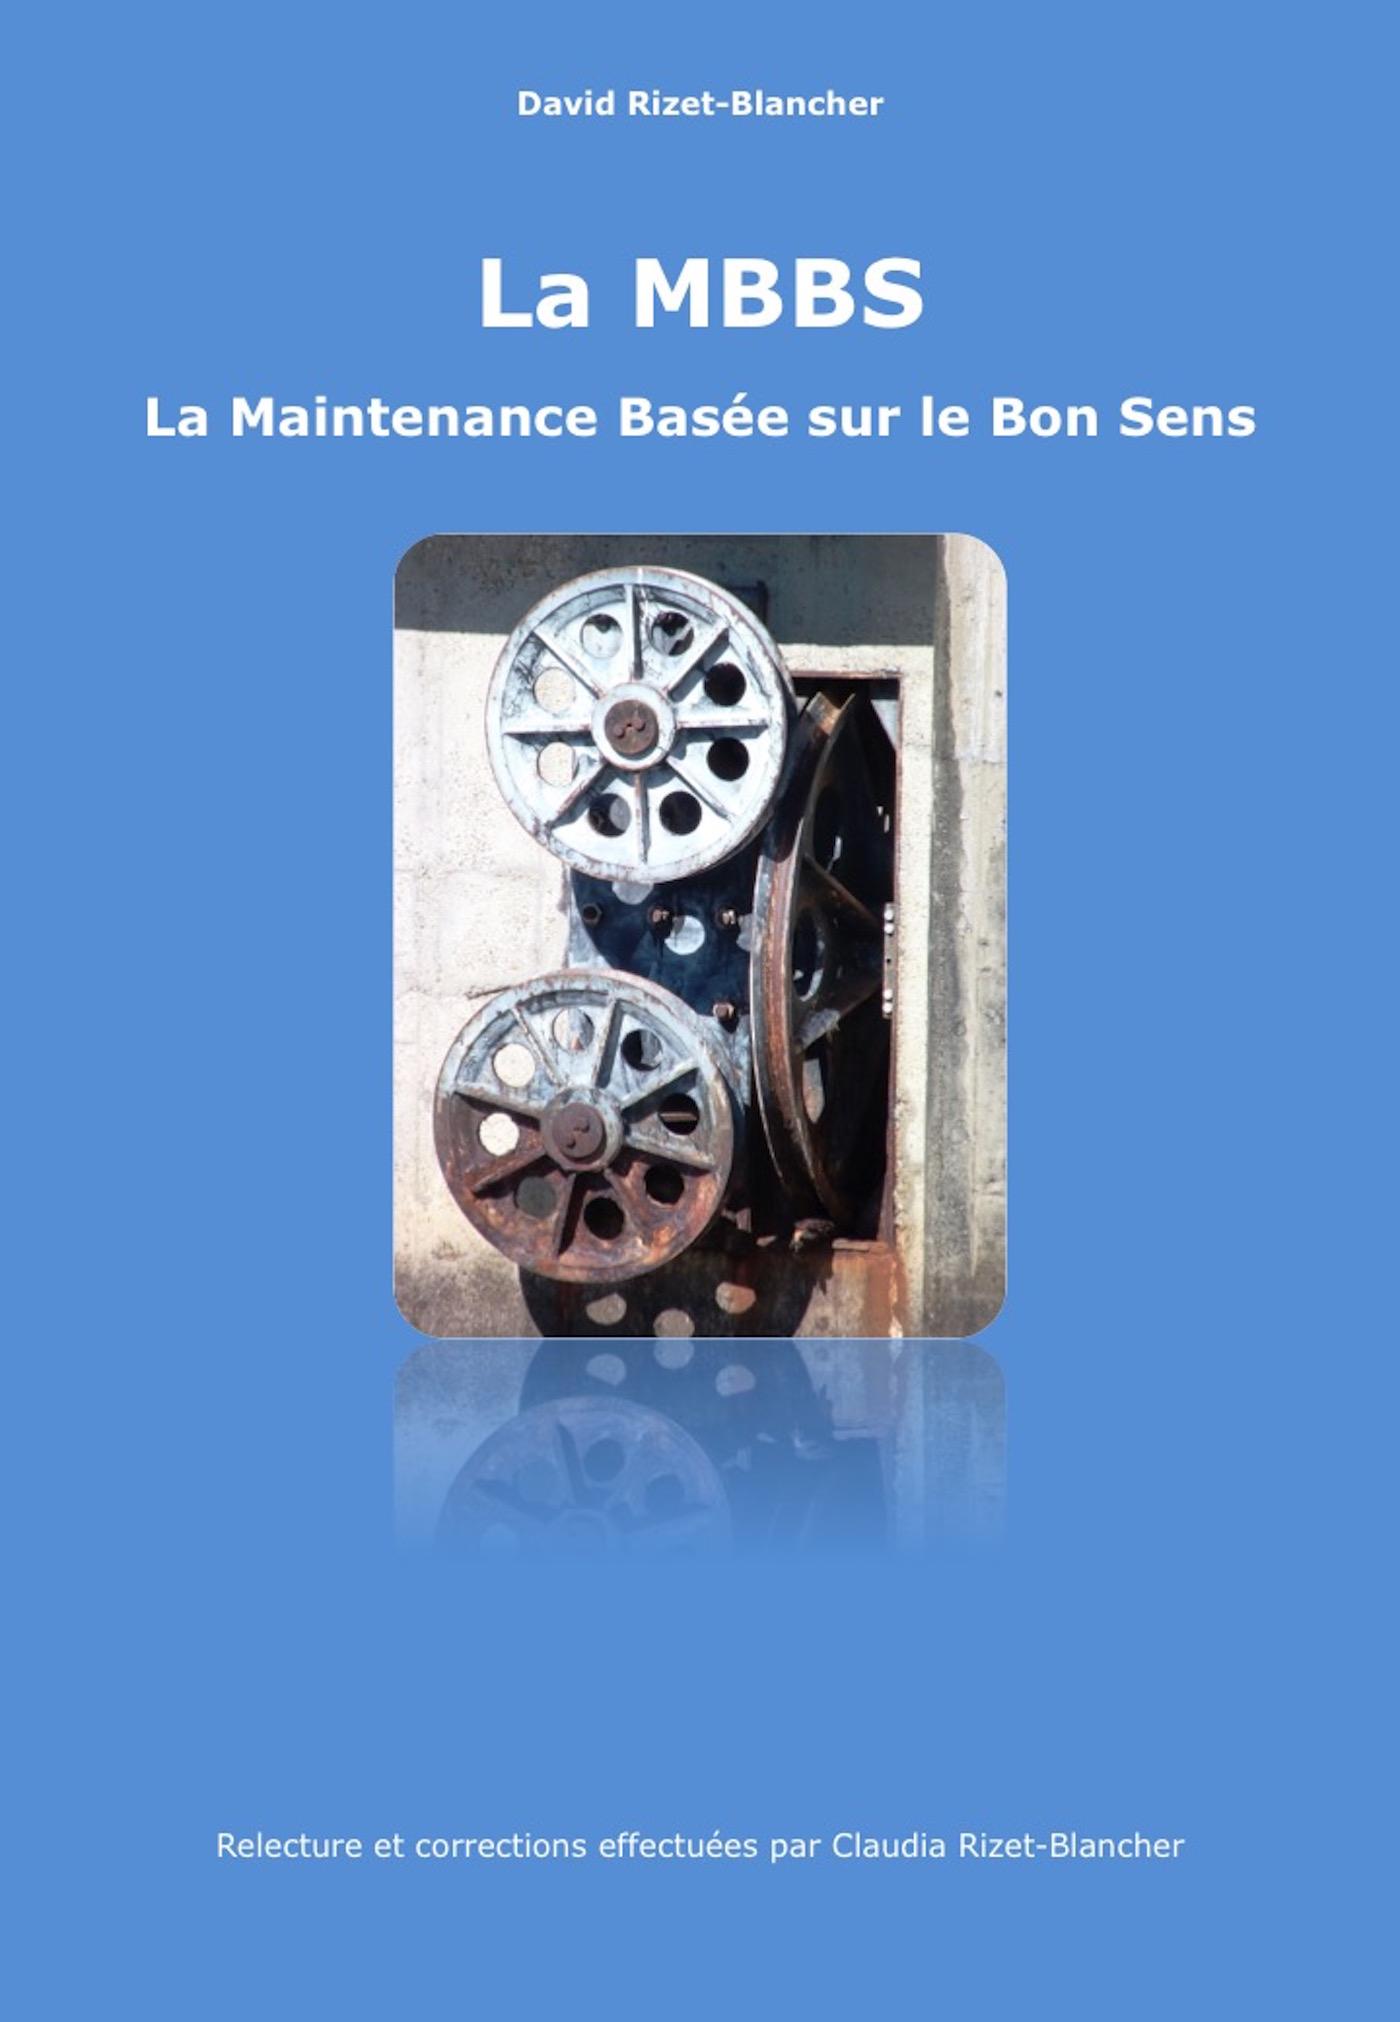 LA MBBS - LA MAINTENANCE BASEE SUR LE BON SENS